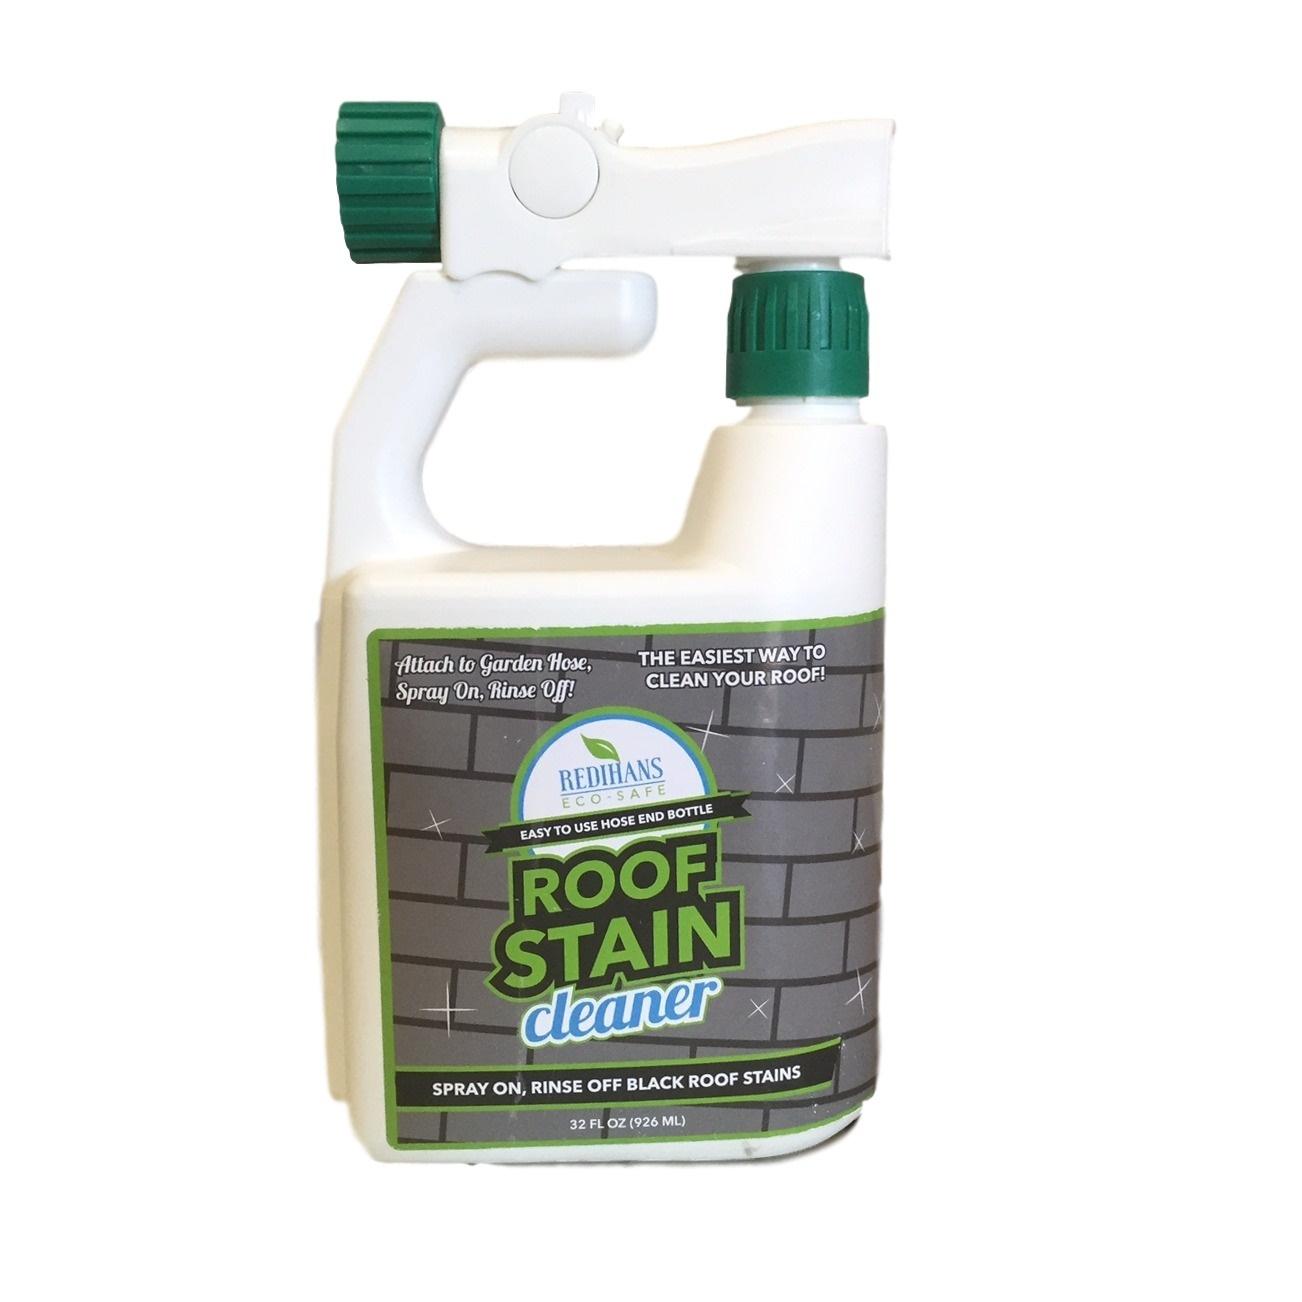 Redihans Eco Safe Roof Stain Cleaner With Hose End Bottle